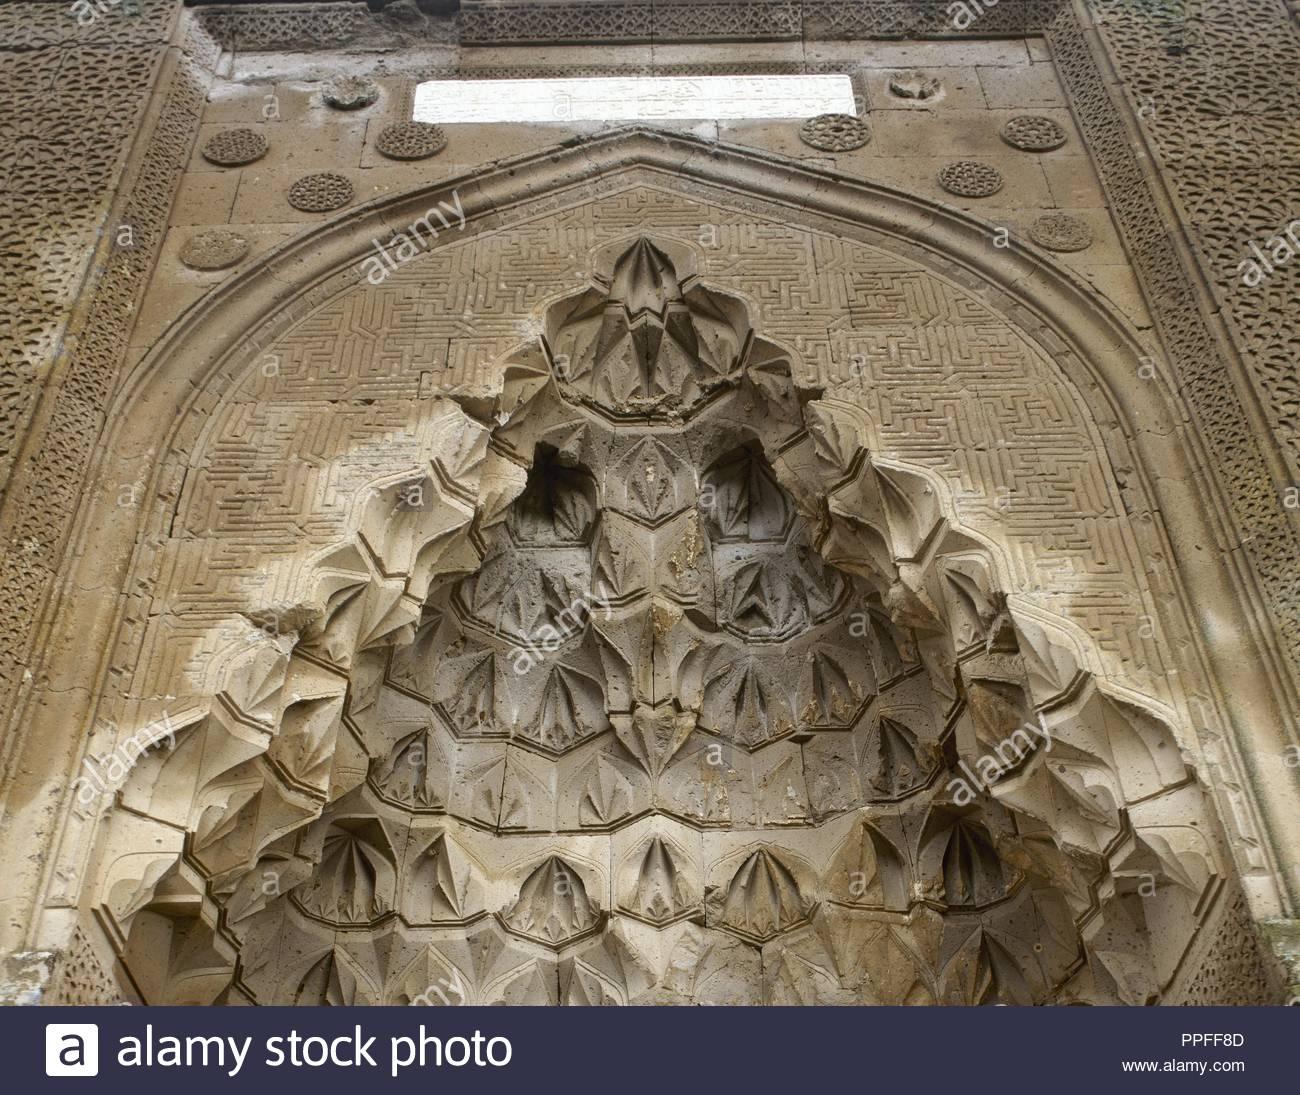 Turkey, Asia Minor, Cappadocia, Agzikarahan-Hoca Mesut Caravanserai. It as built between 1231-1239. Seljuq style. Architectural detail, entrance with mocarabe half-dome. - Stock Image